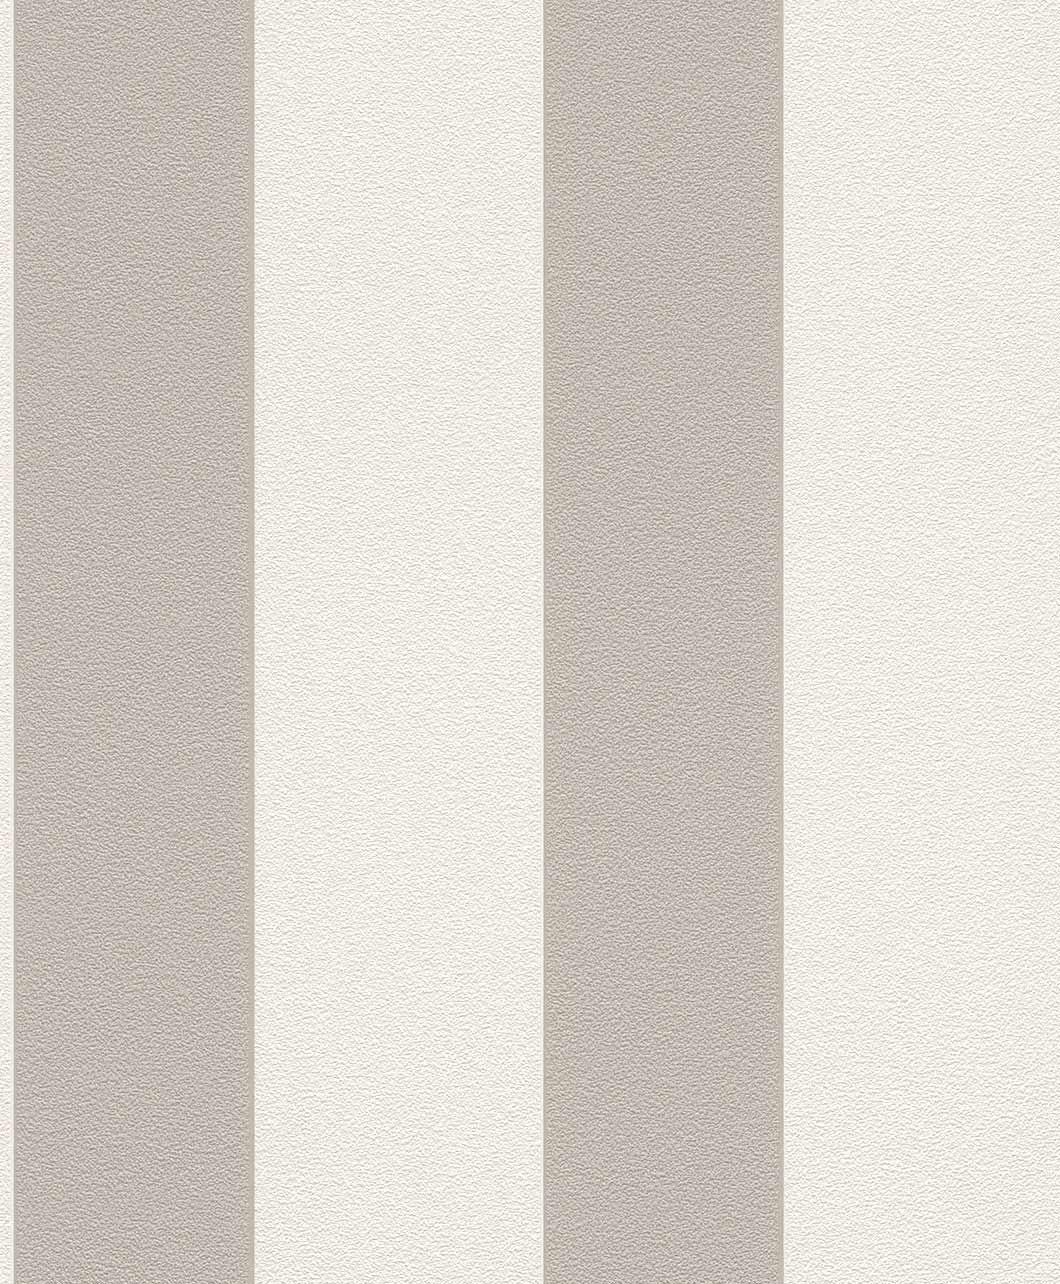 Rasch Vliestapete Prego 700350 Struktur Einfarbig Grau